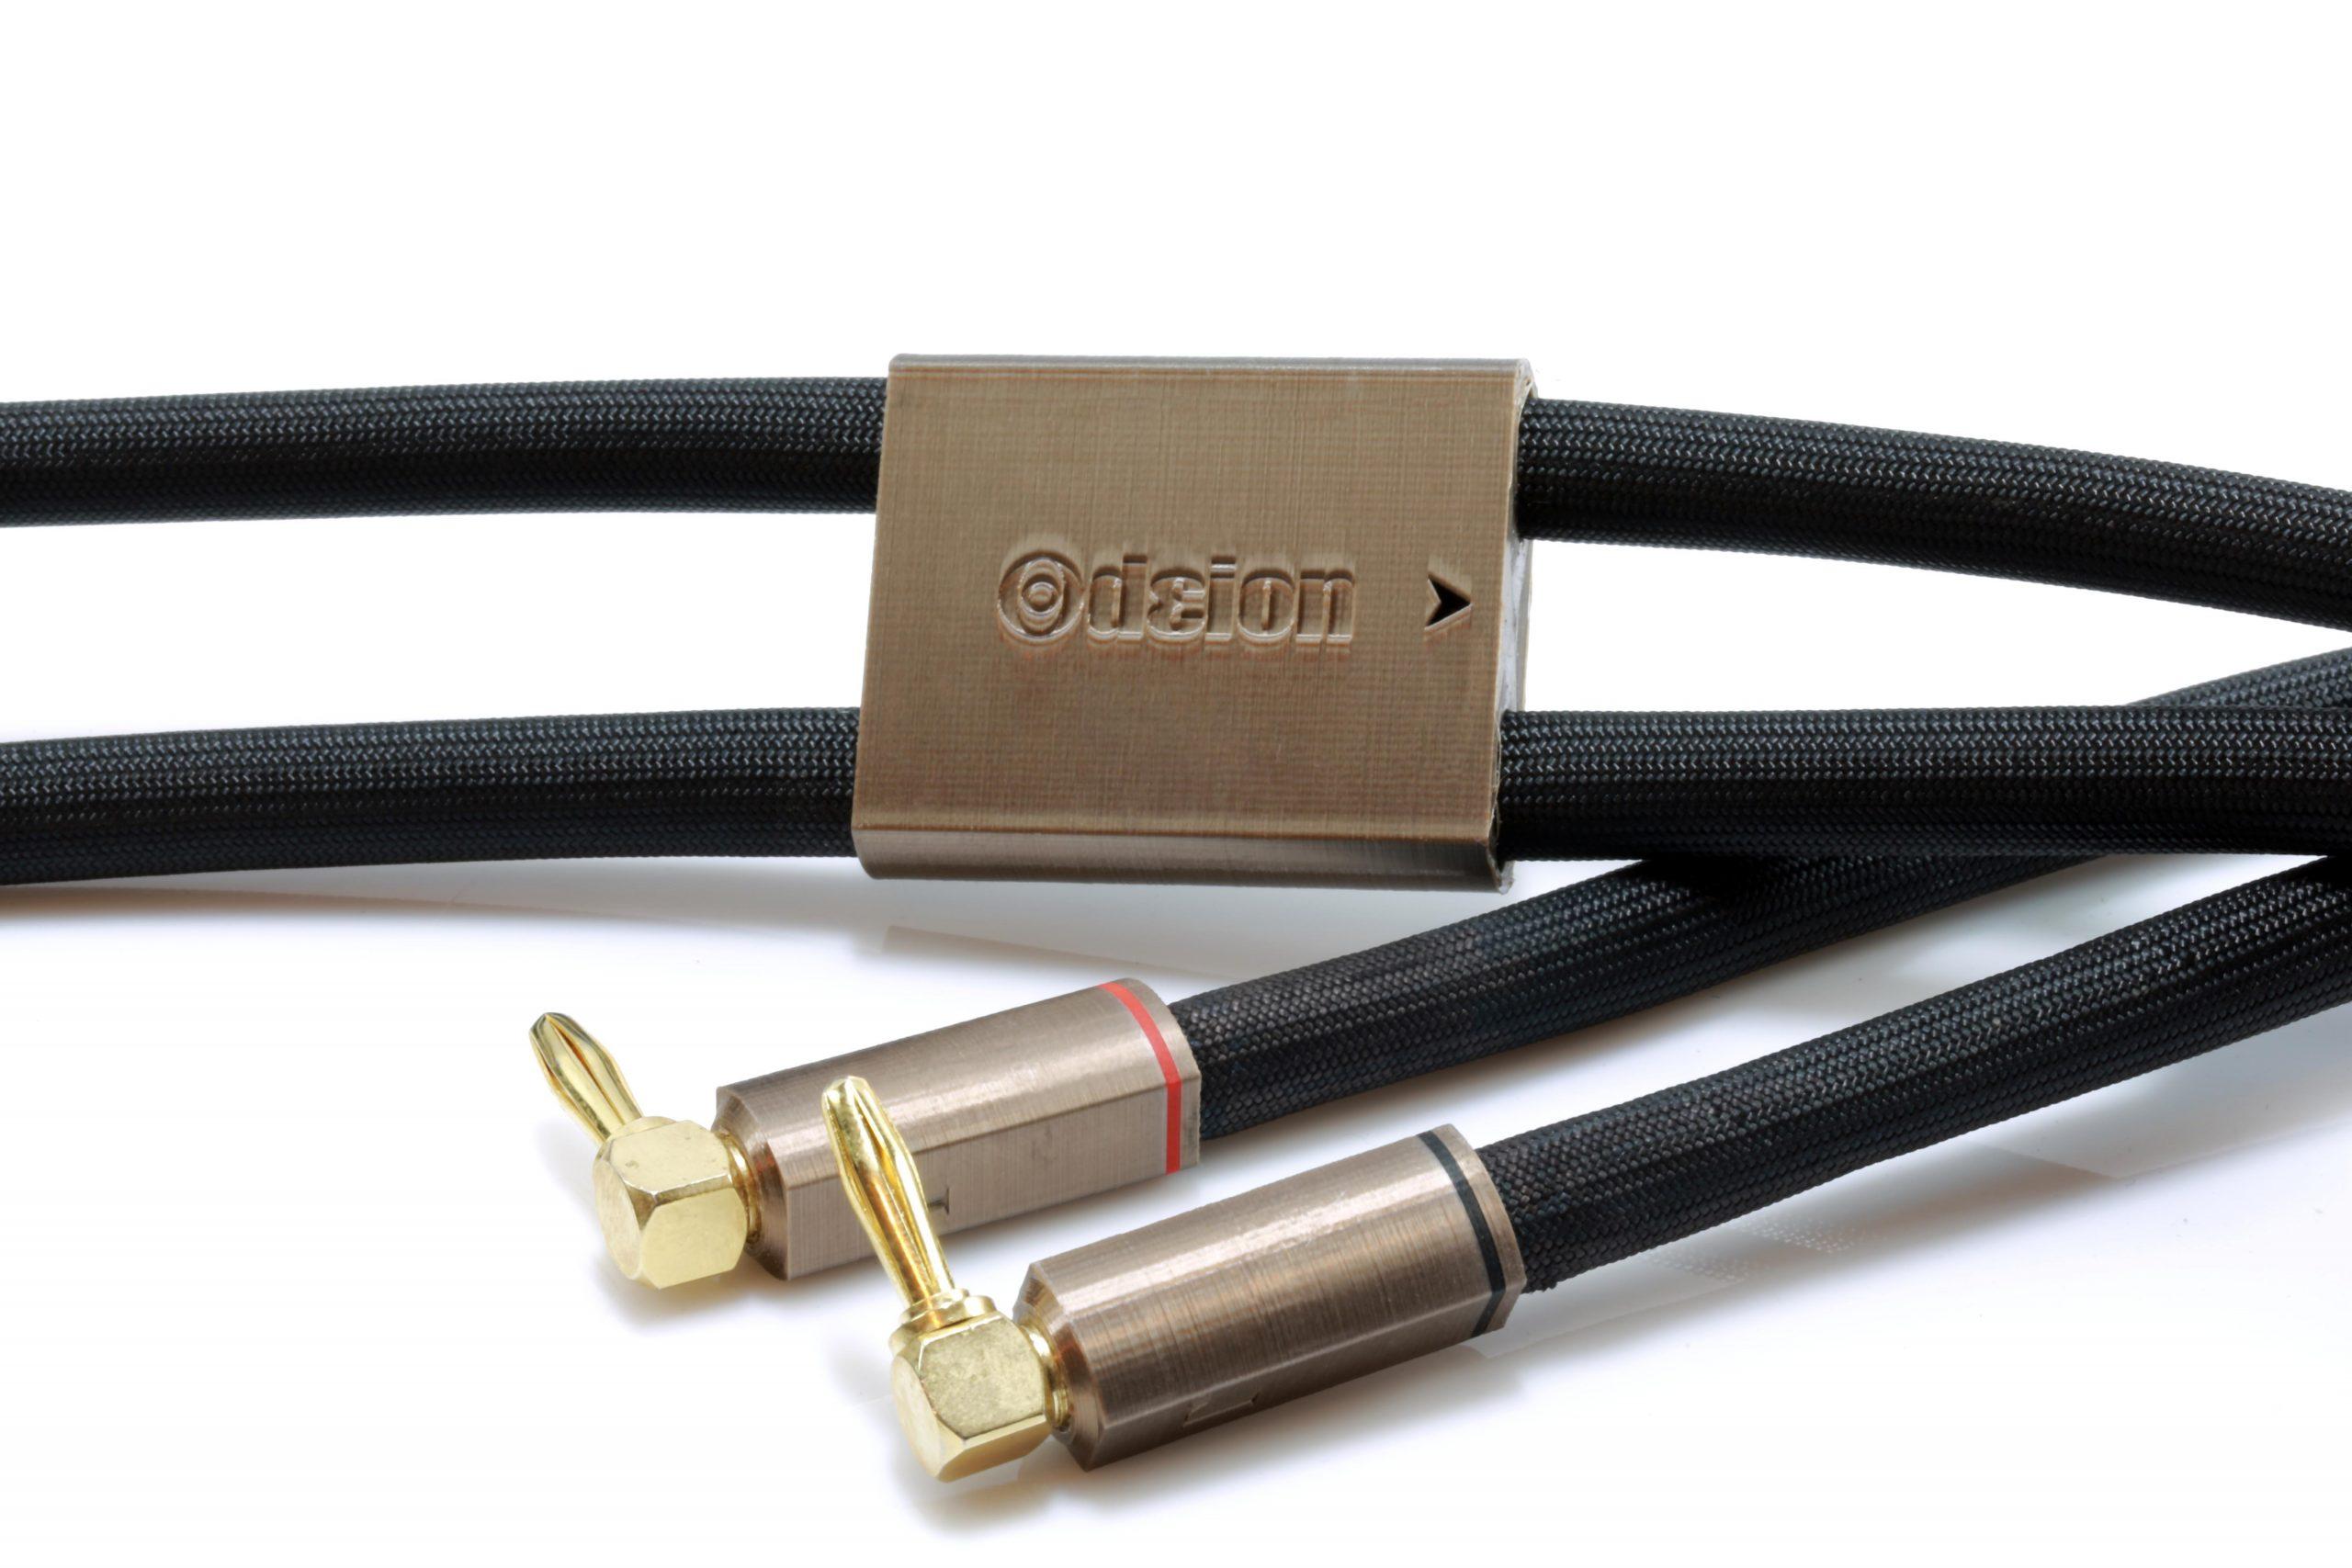 Gamma HP Speaker Odeion Cables (détail)